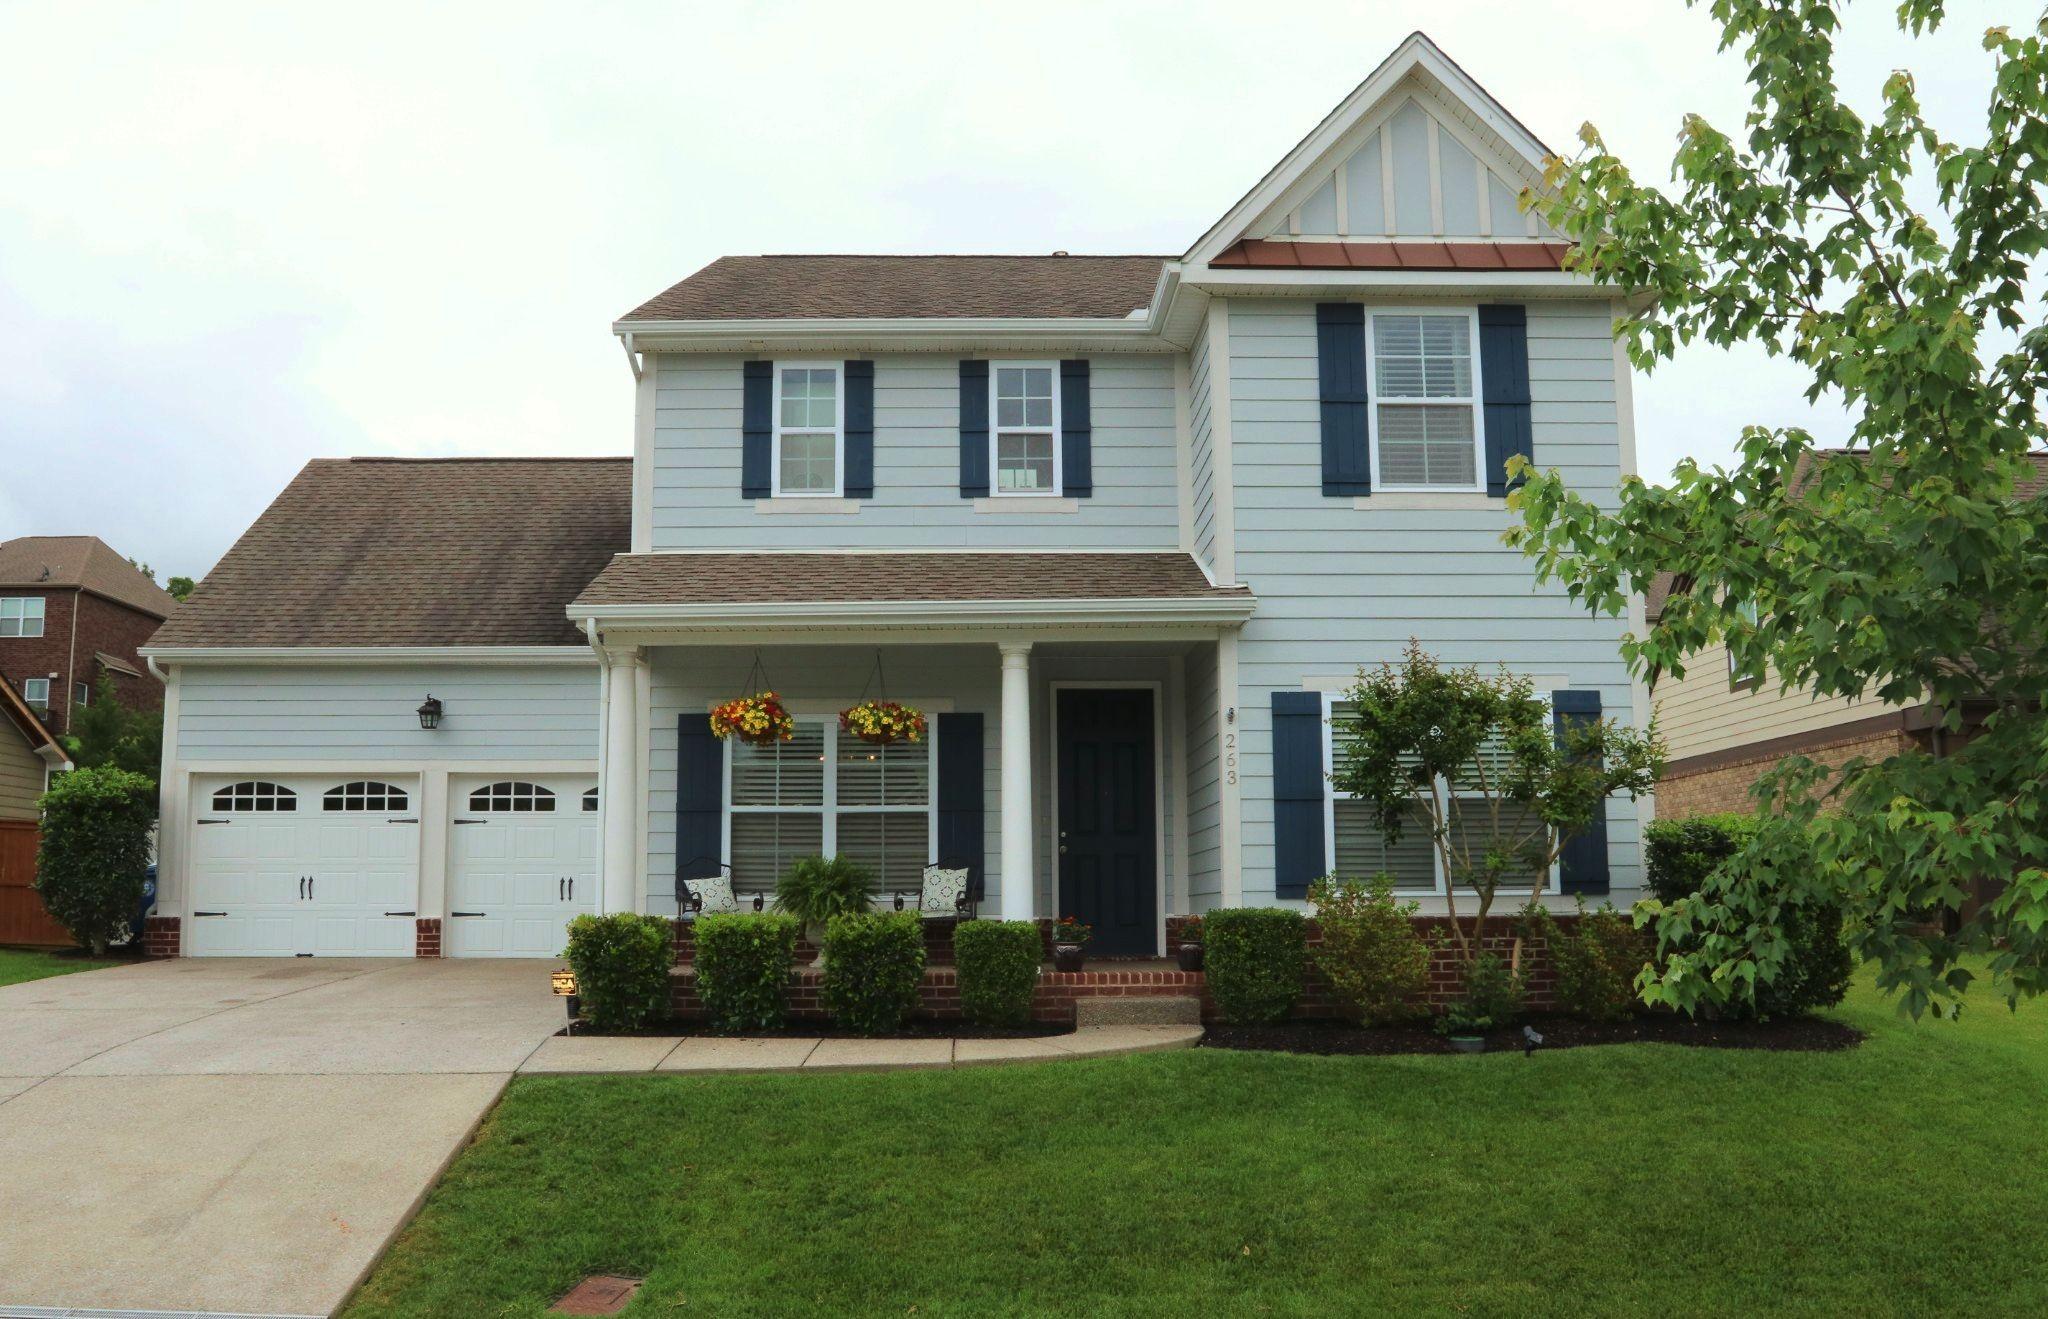 263 Irvine Ln, Franklin, TN 37064 - Franklin, TN real estate listing